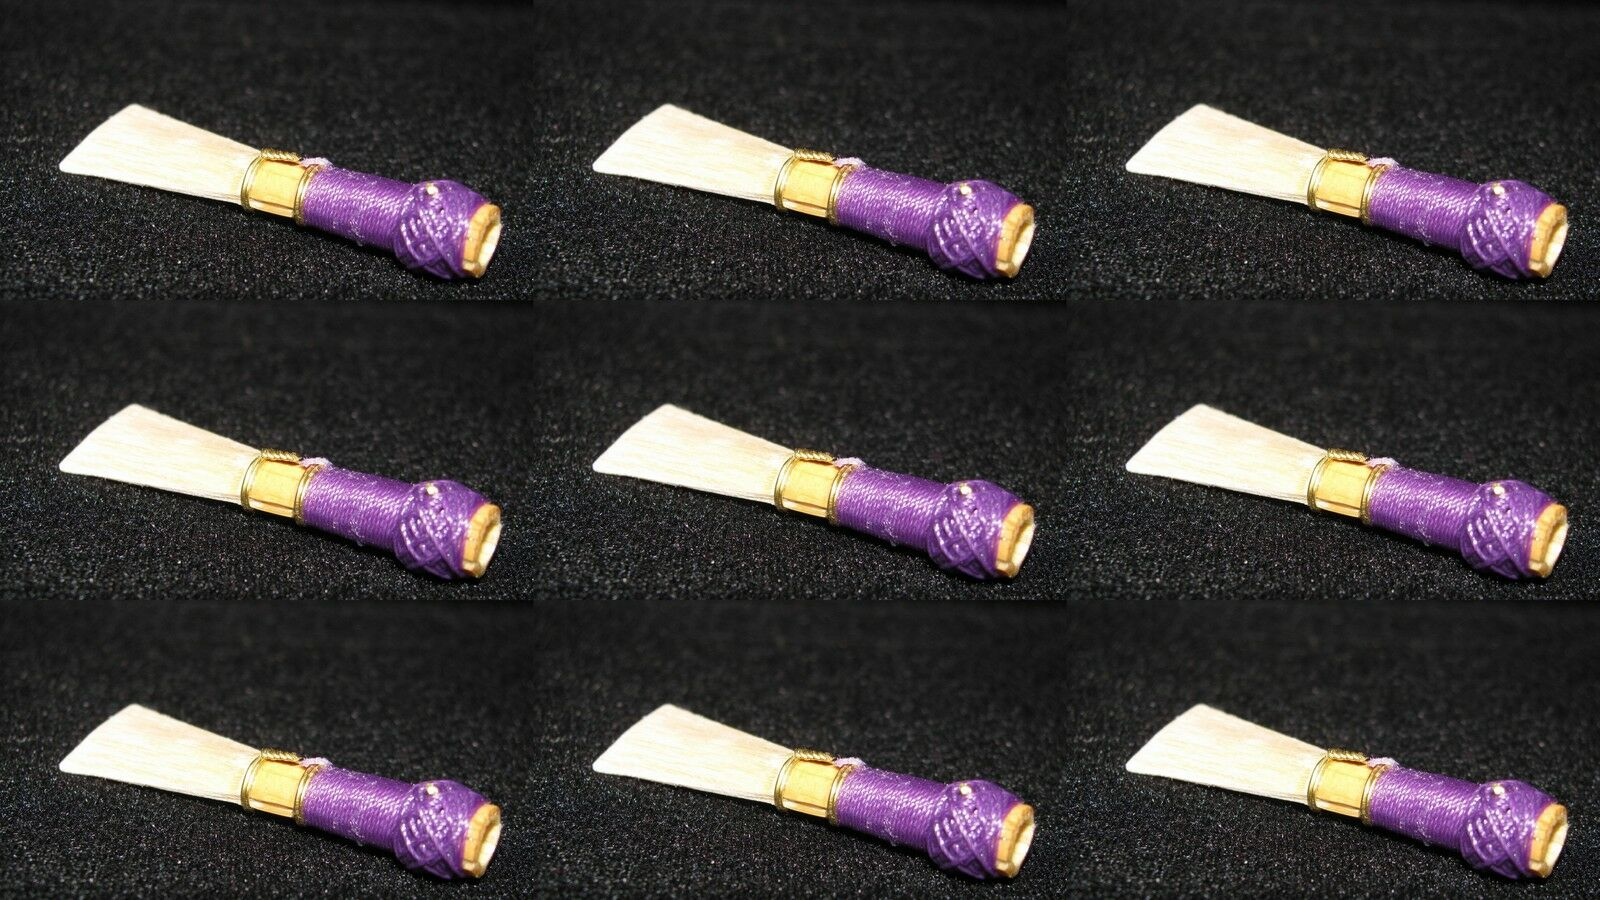 le migliori marche vendono a buon mercato 10 anches de fagot basson allemand fabrication francaise francaise francaise qualité professionnelle  alta quaità